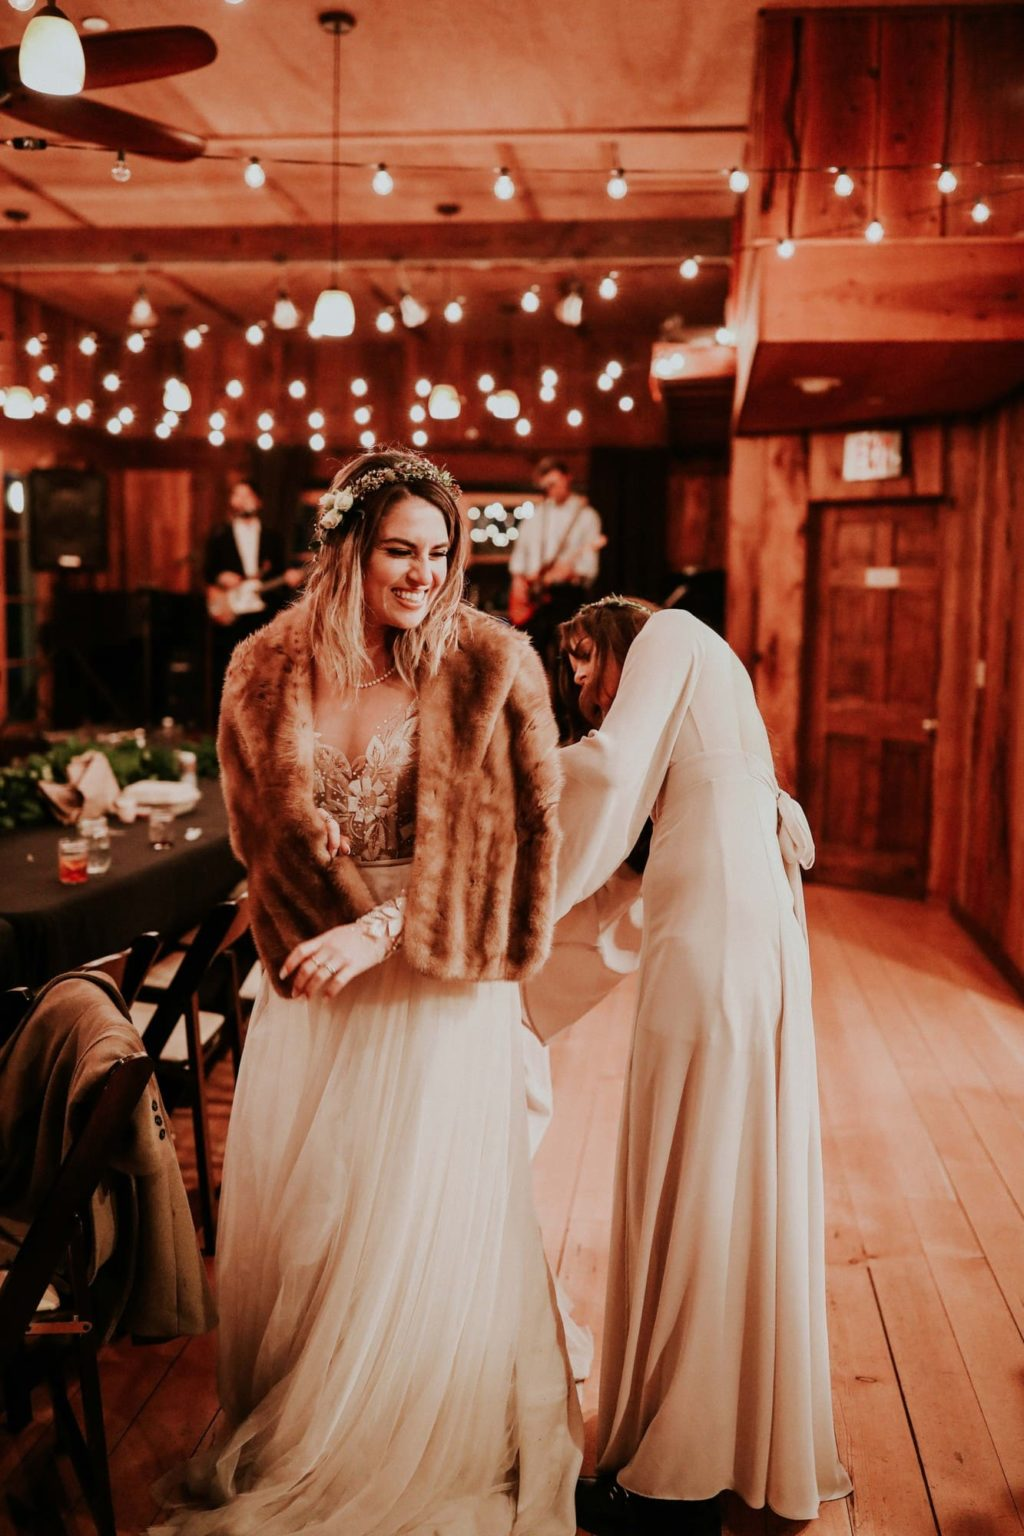 Bridesmaids bustling bride's wedding dress